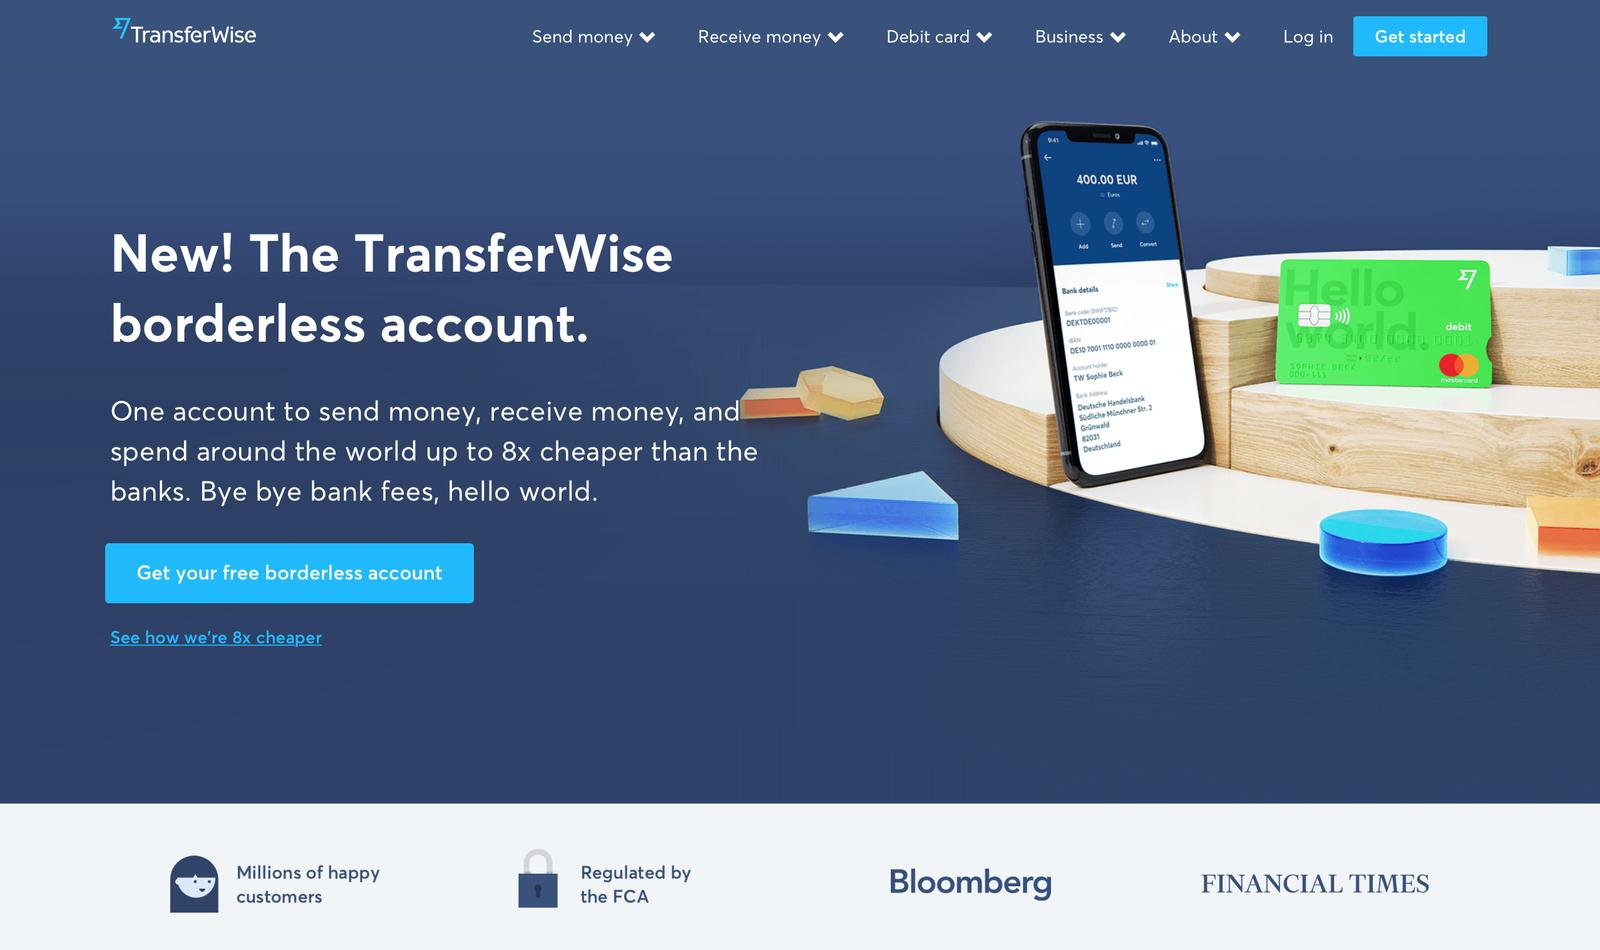 transferwise landing page design